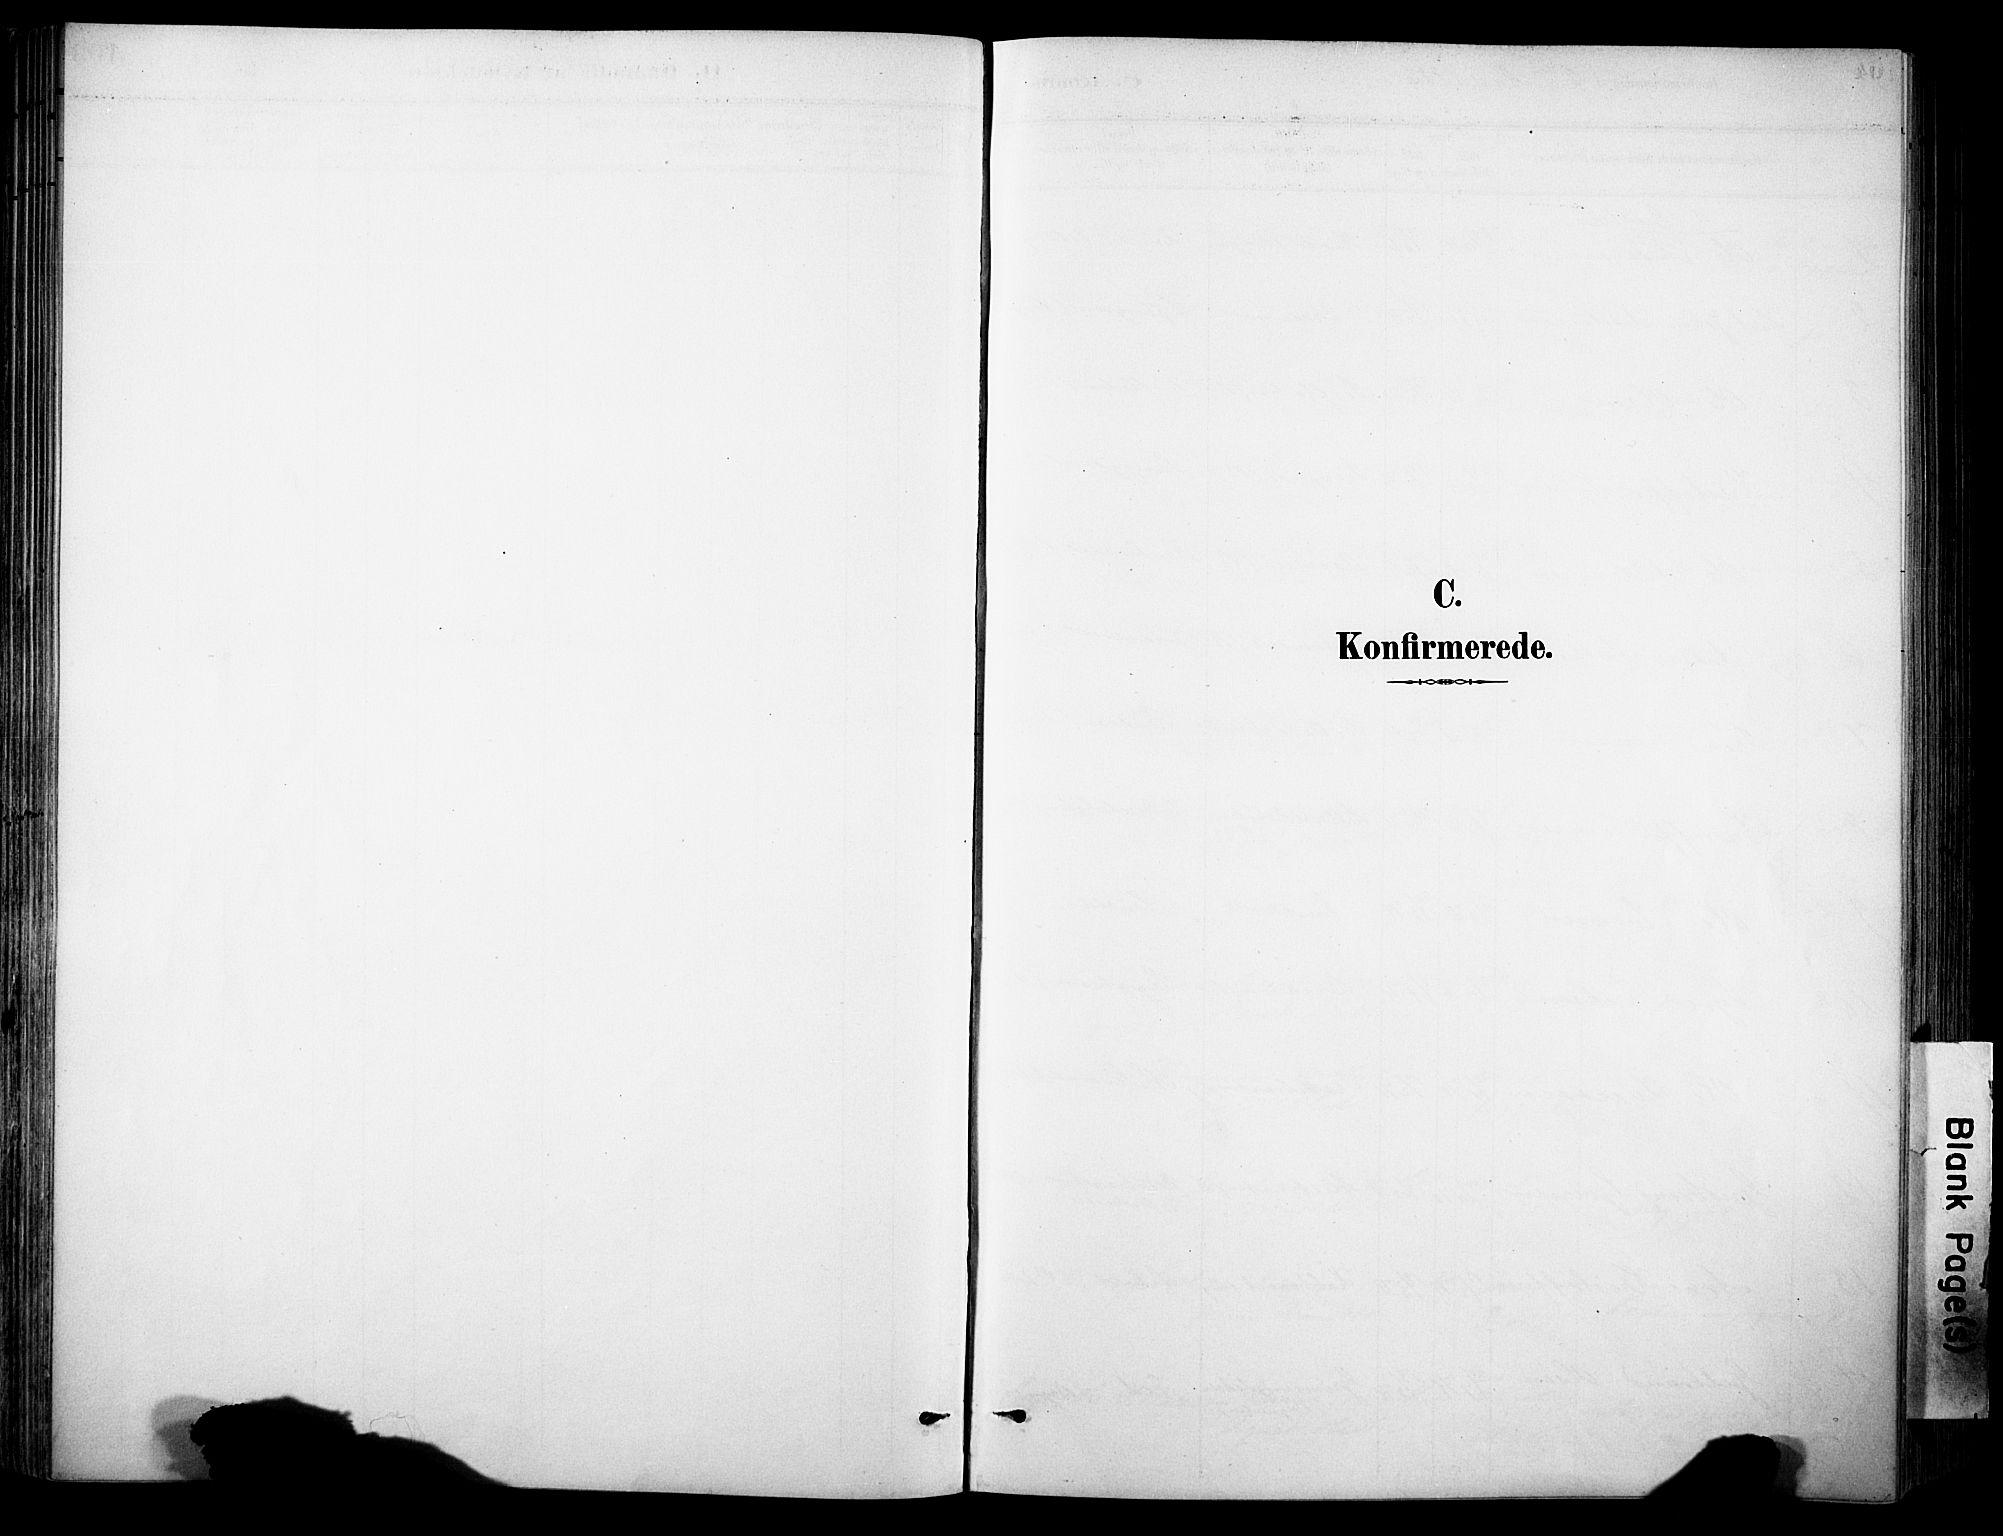 SAH, Sør-Aurdal prestekontor, Ministerialbok nr. 9, 1886-1906